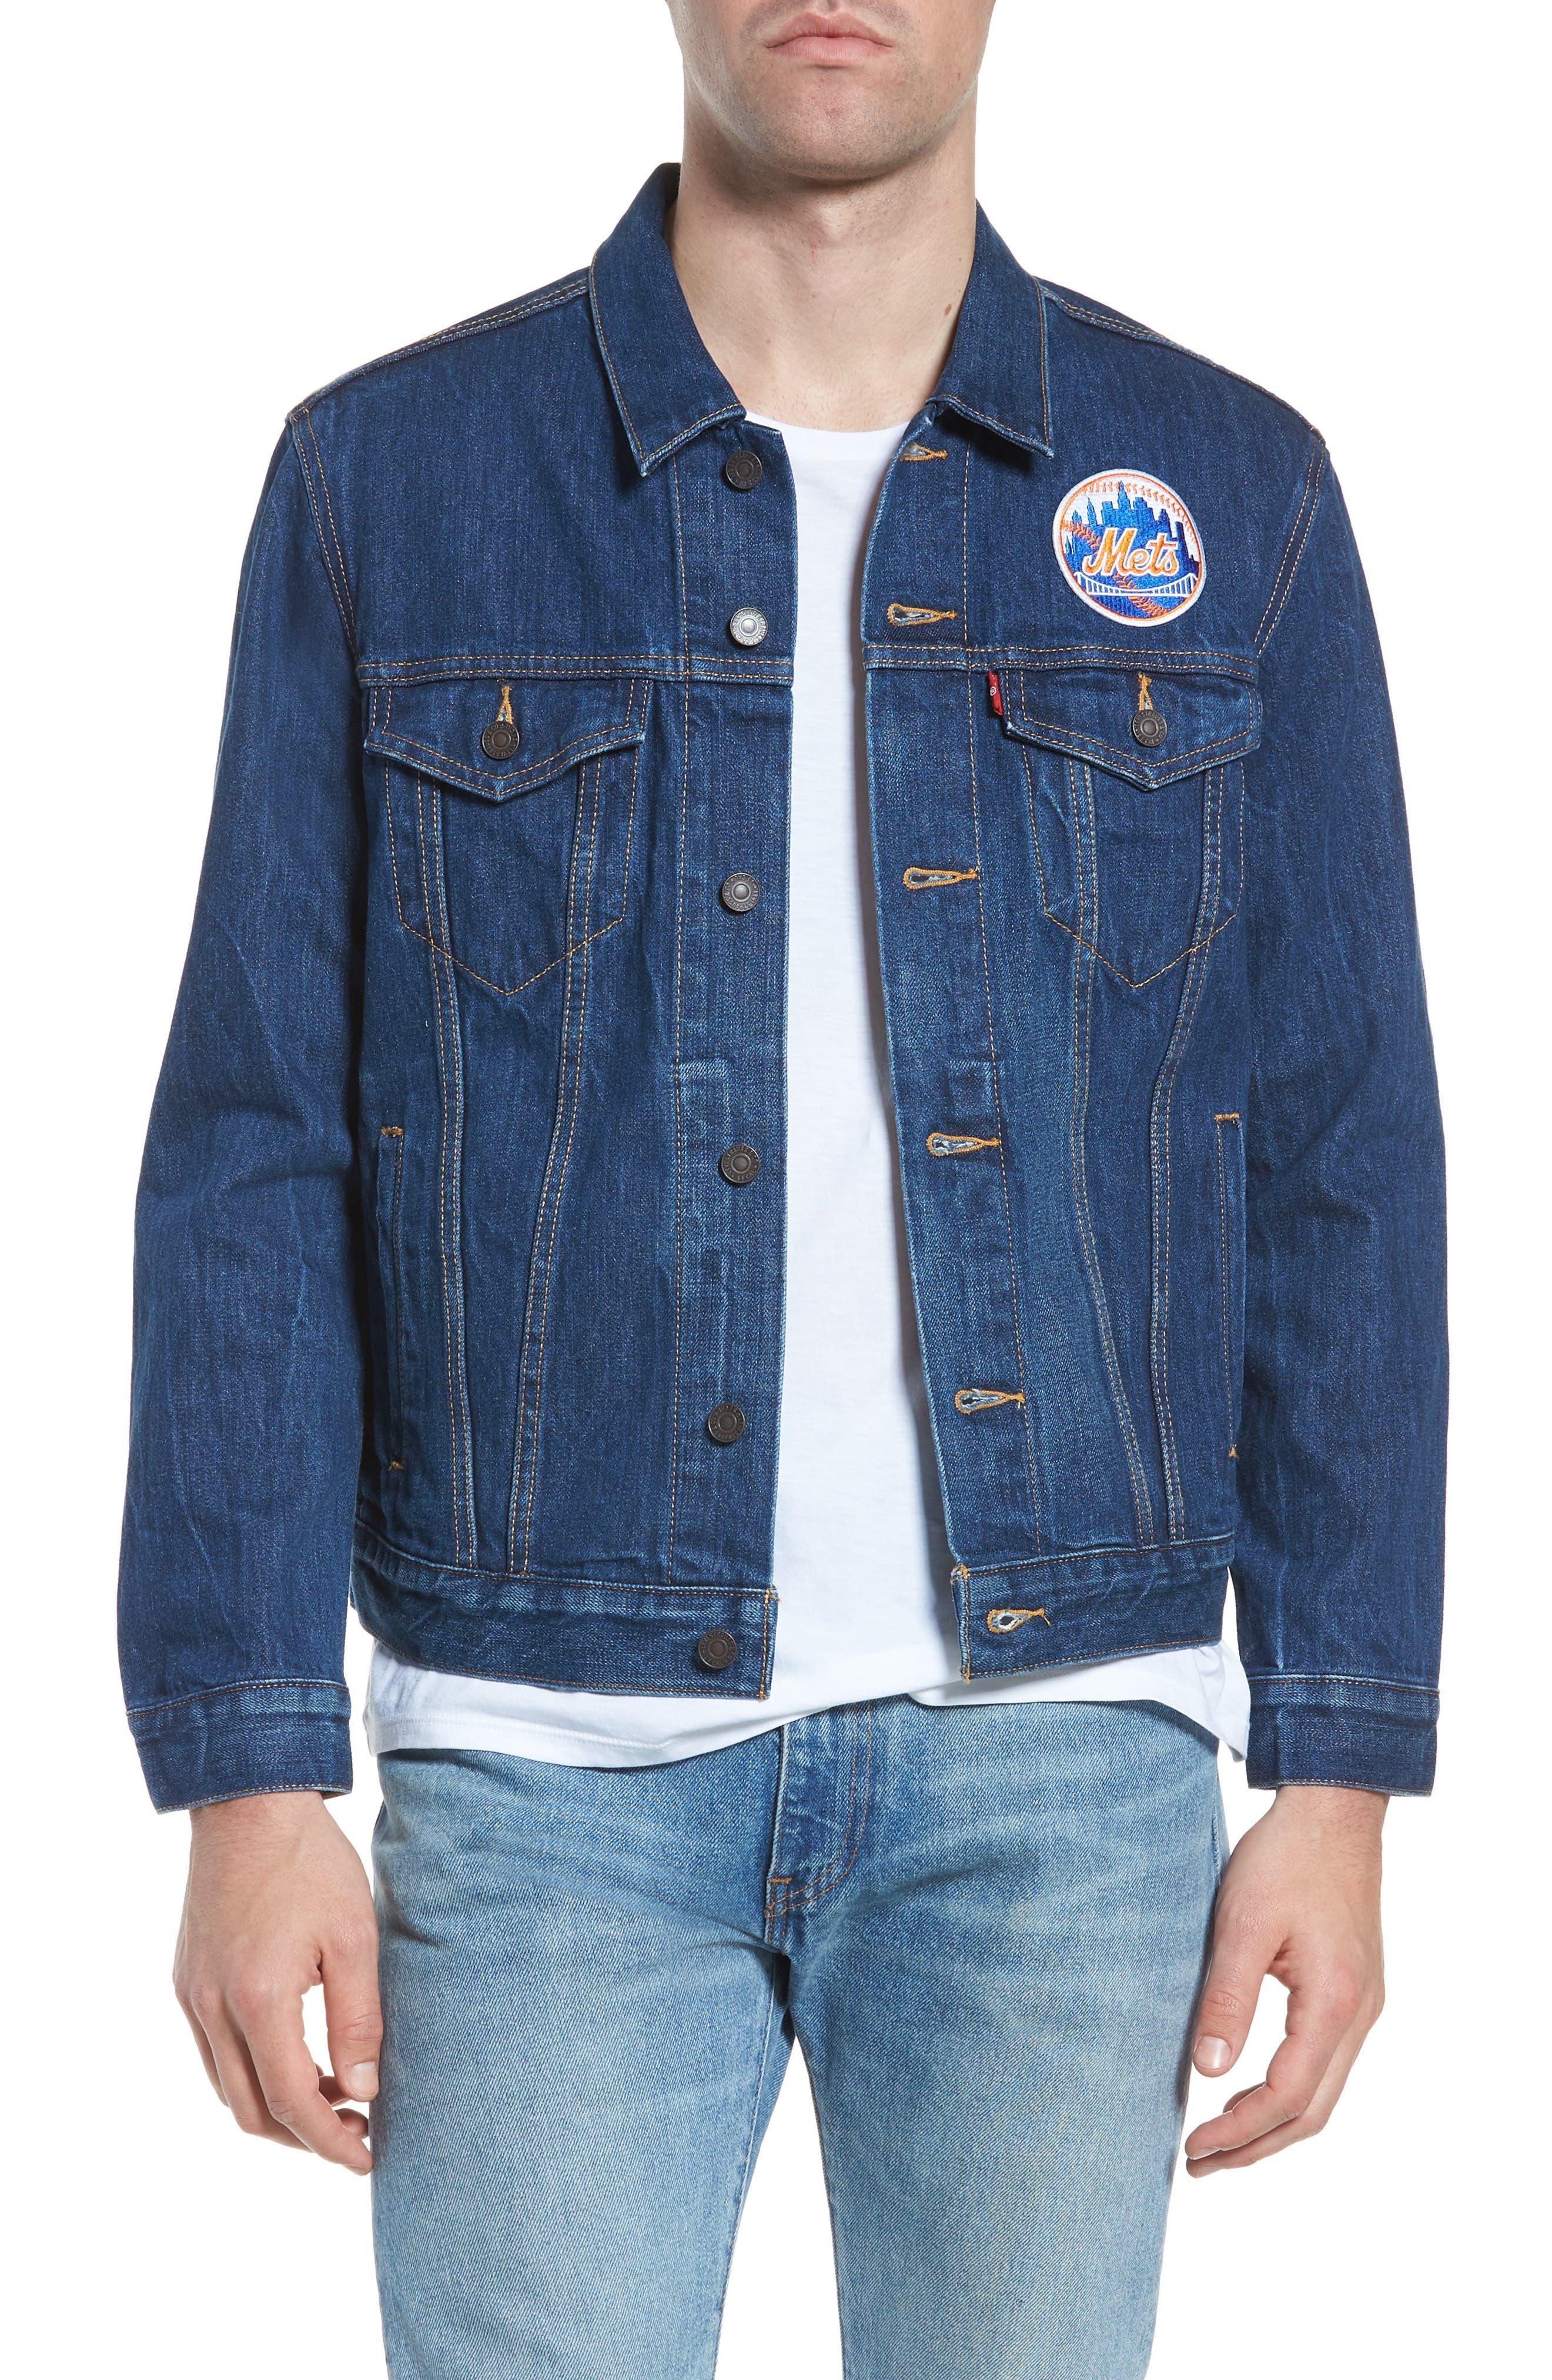 MLB Mets Denim Trucker Jacket,                         Main,                         color, Mets